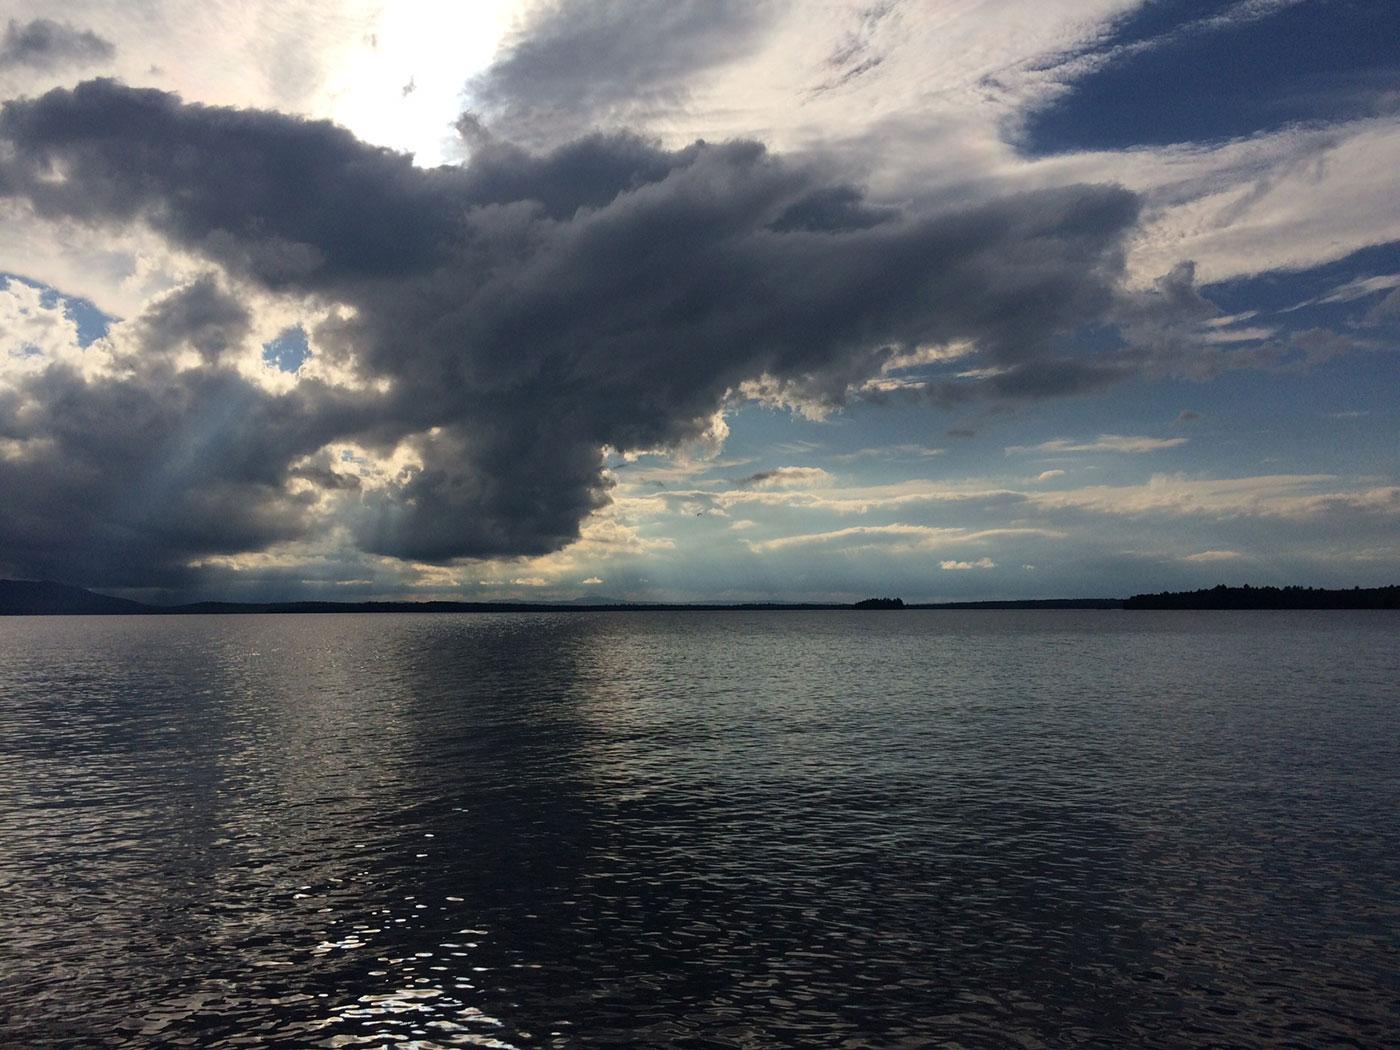 Moosehead Lake by Vivienne Lenk and Walter Mugdan